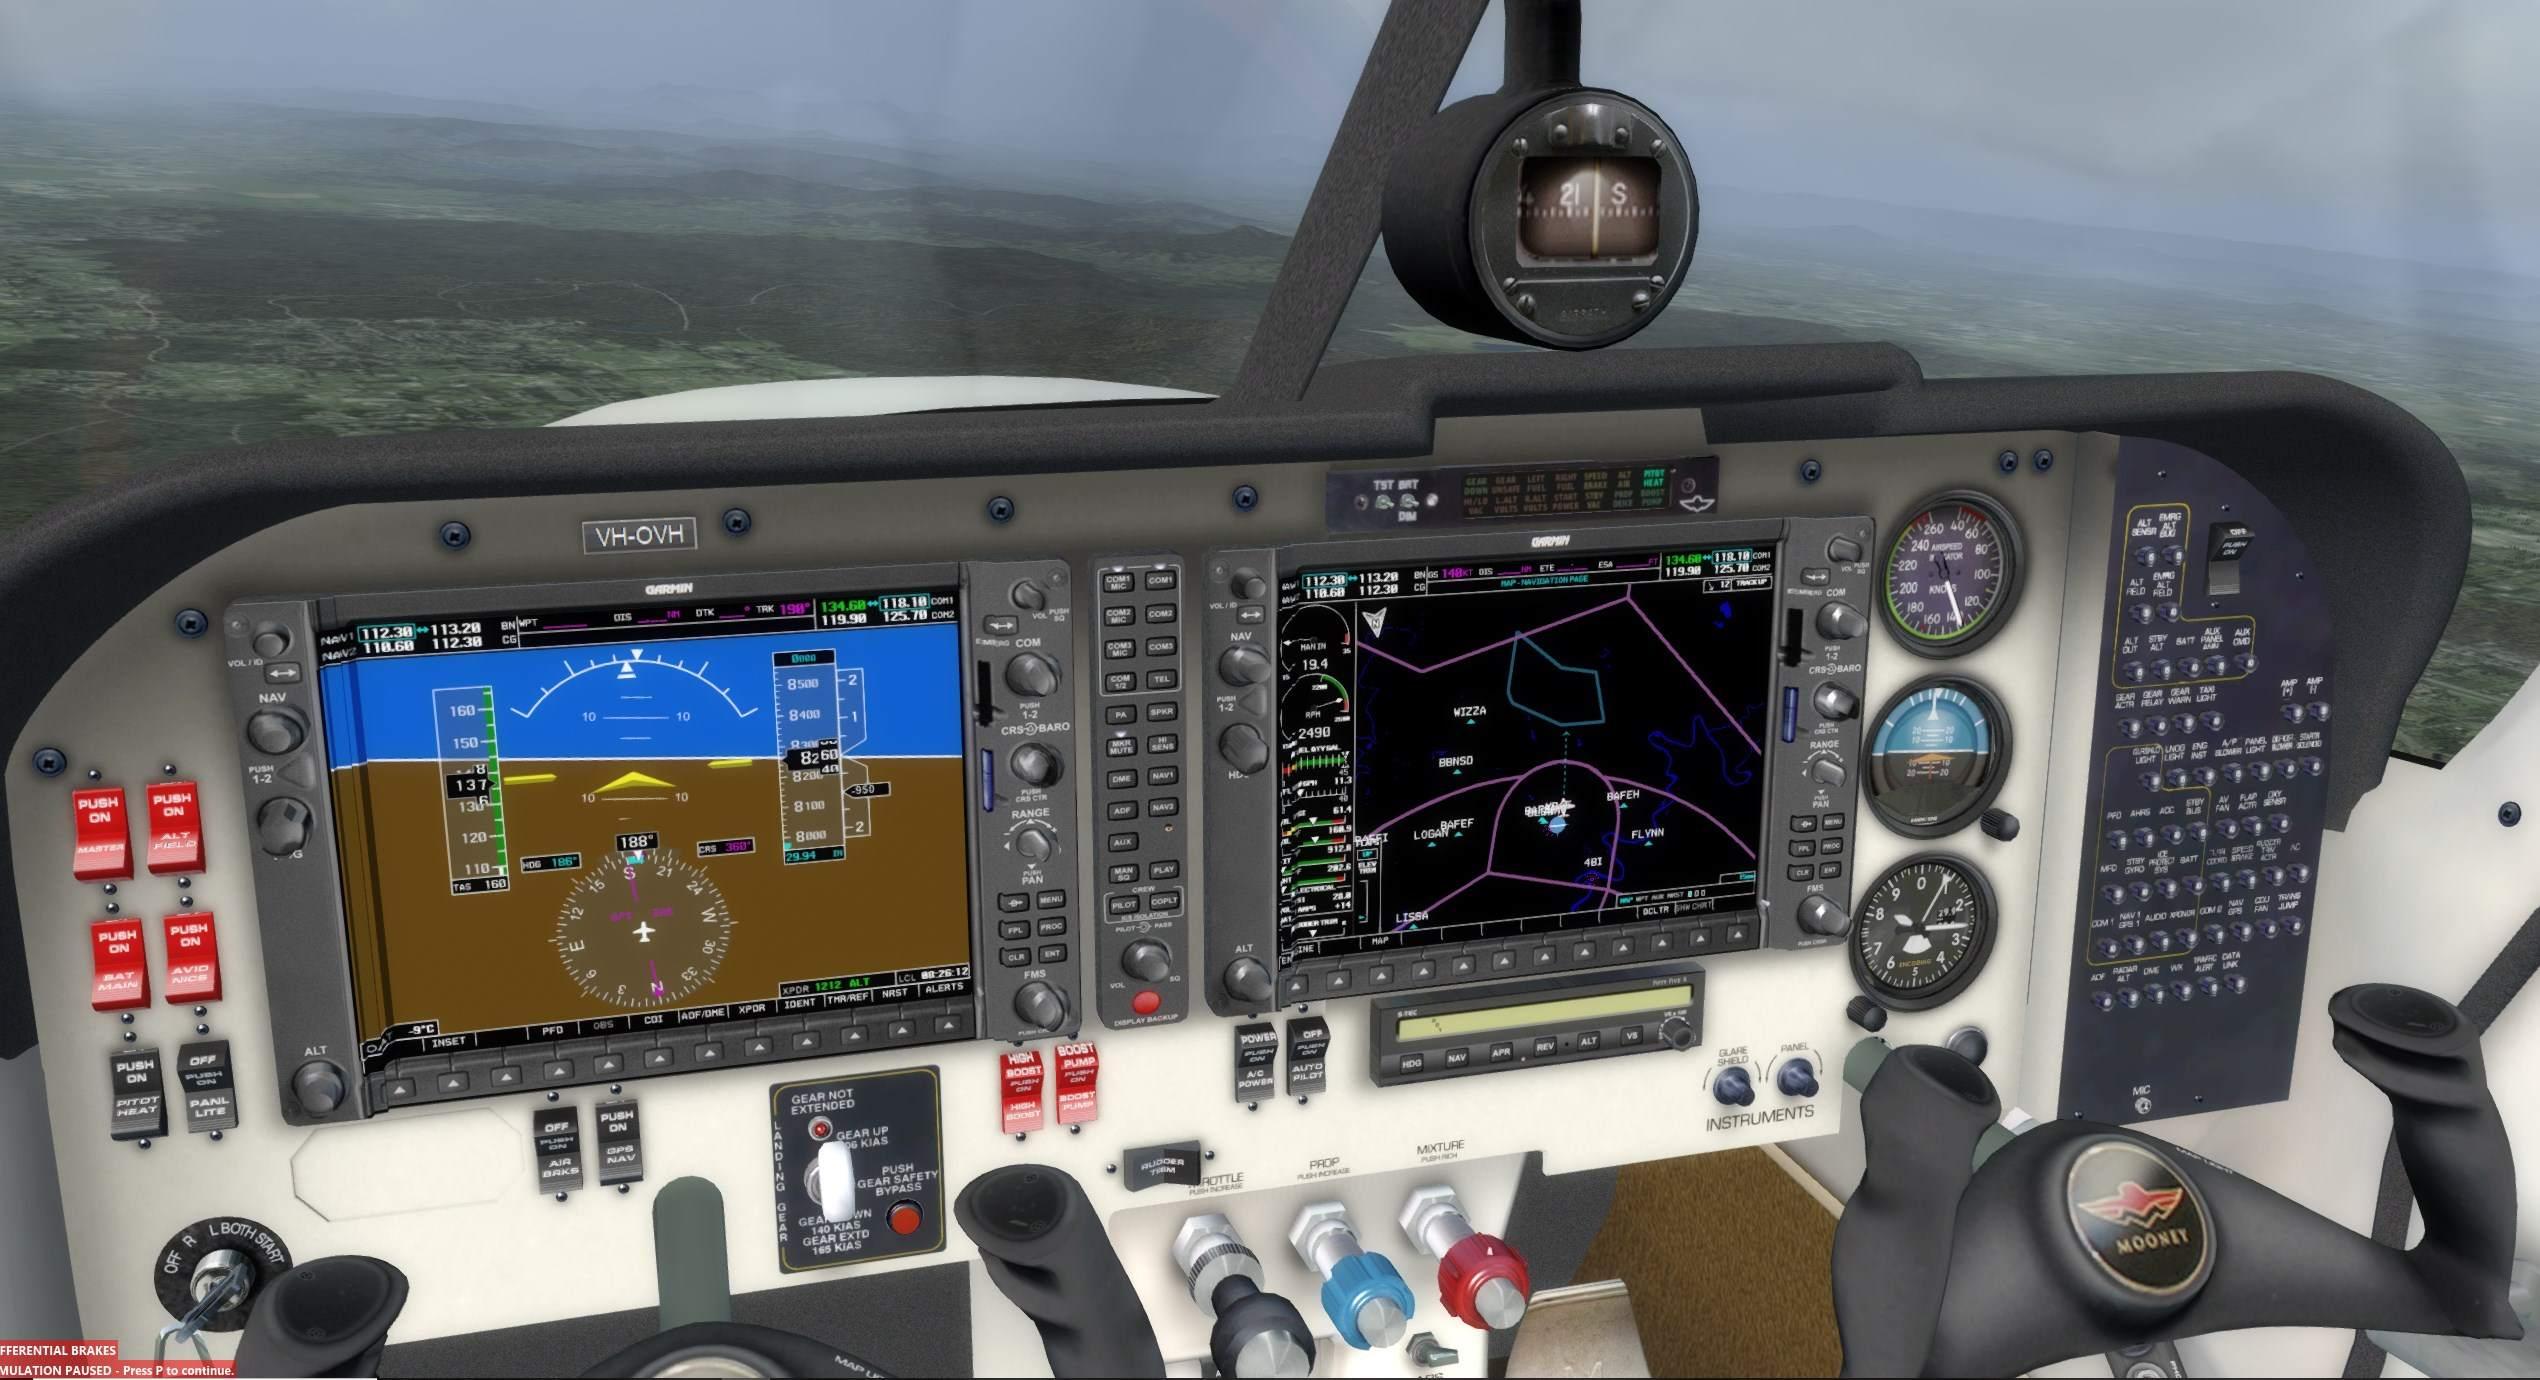 OVH_sim_air.jpg.7d3427a905f5d898c2c82414